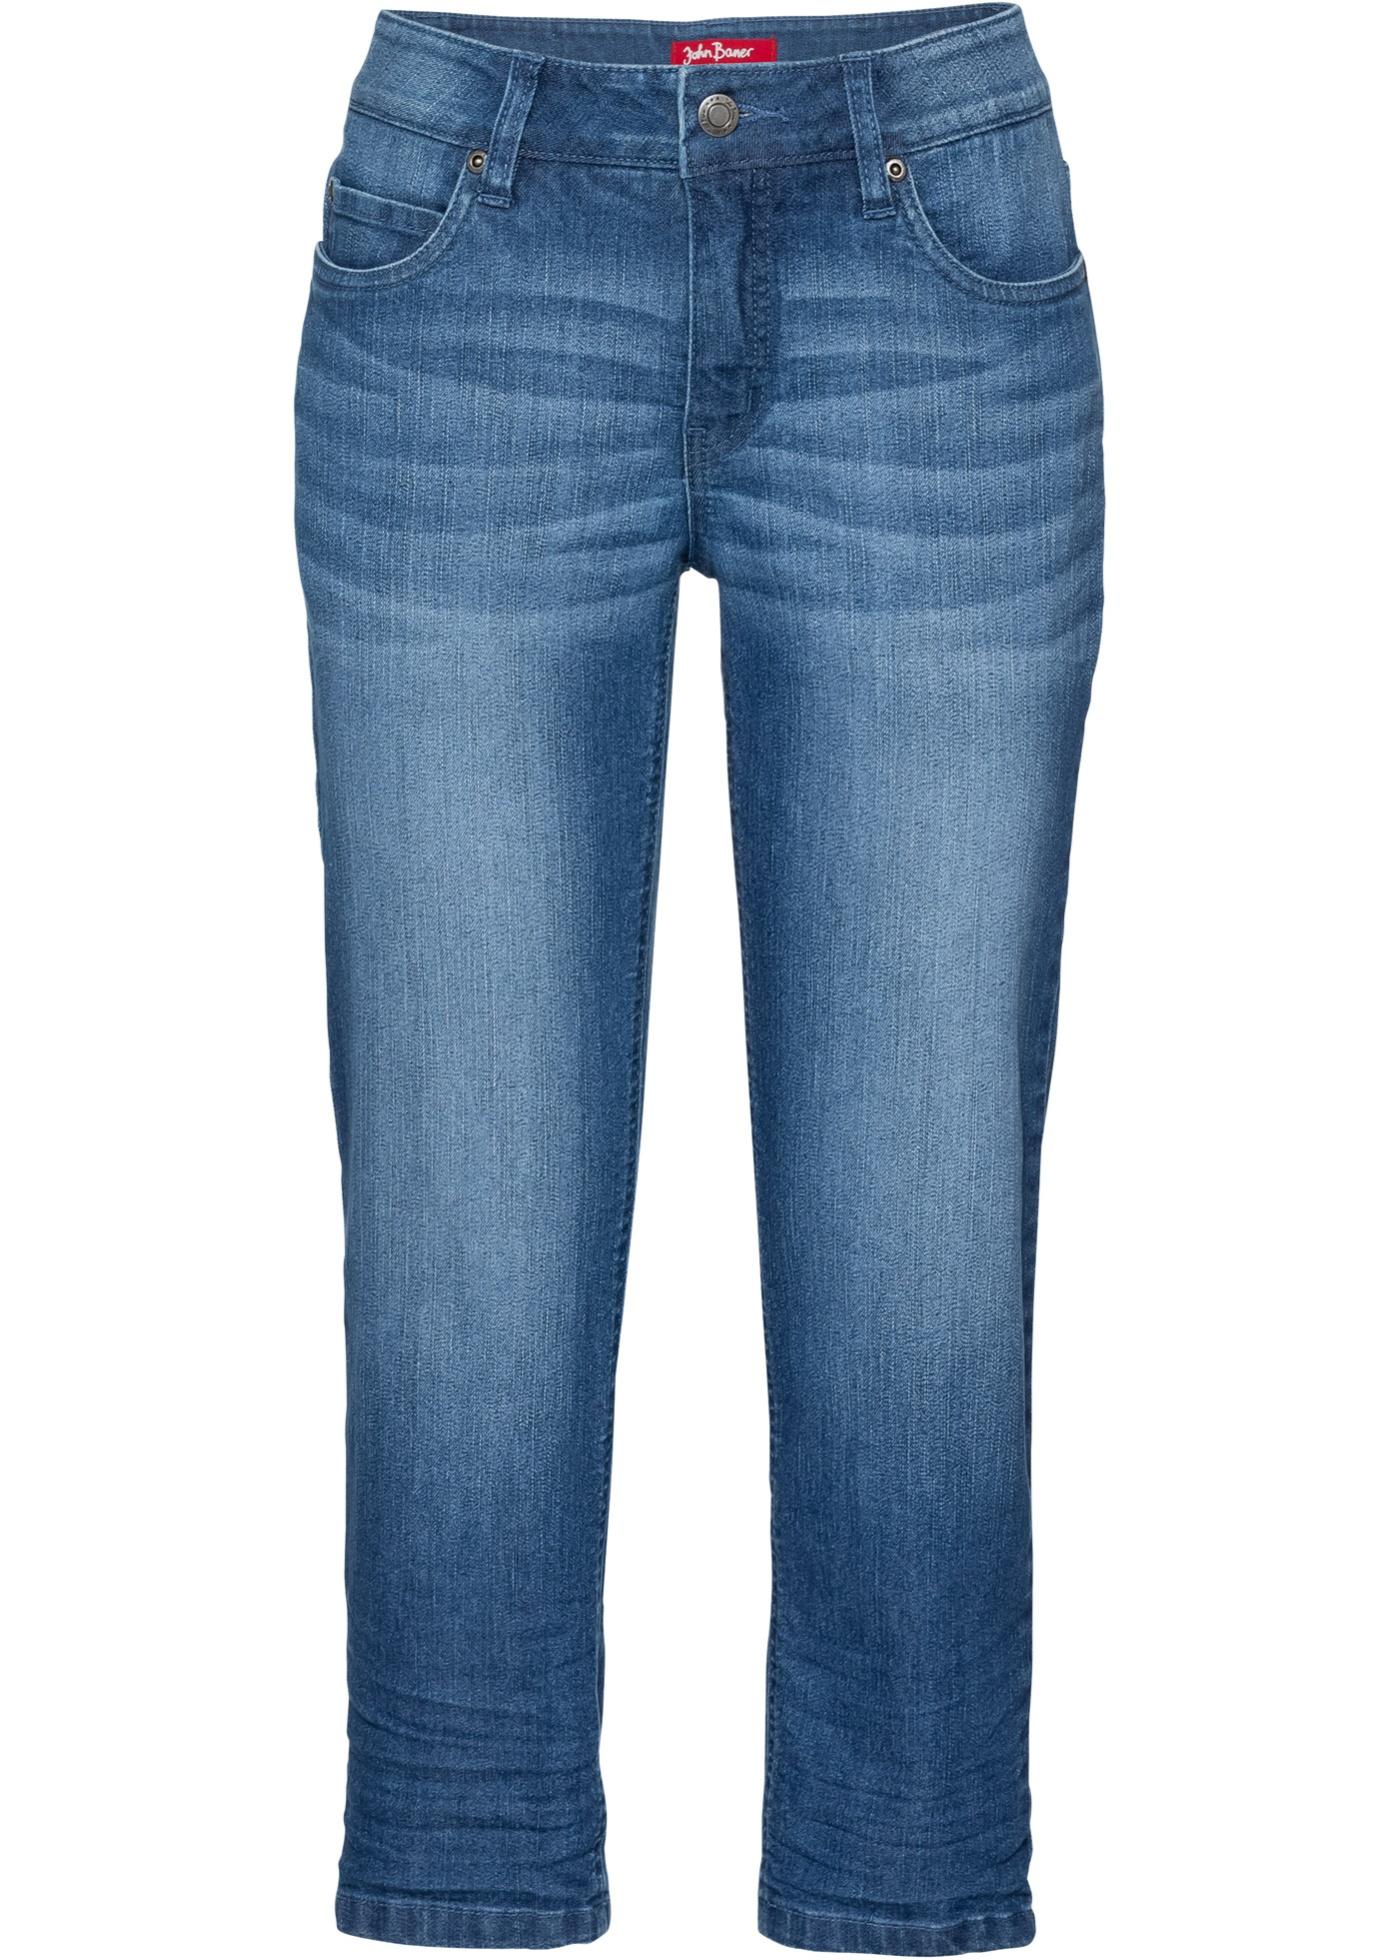 Femme BonprixJean Extensible Jeanswear Longueur 3 Bleu Pour John Baner Confort 4 rdQCtshxB